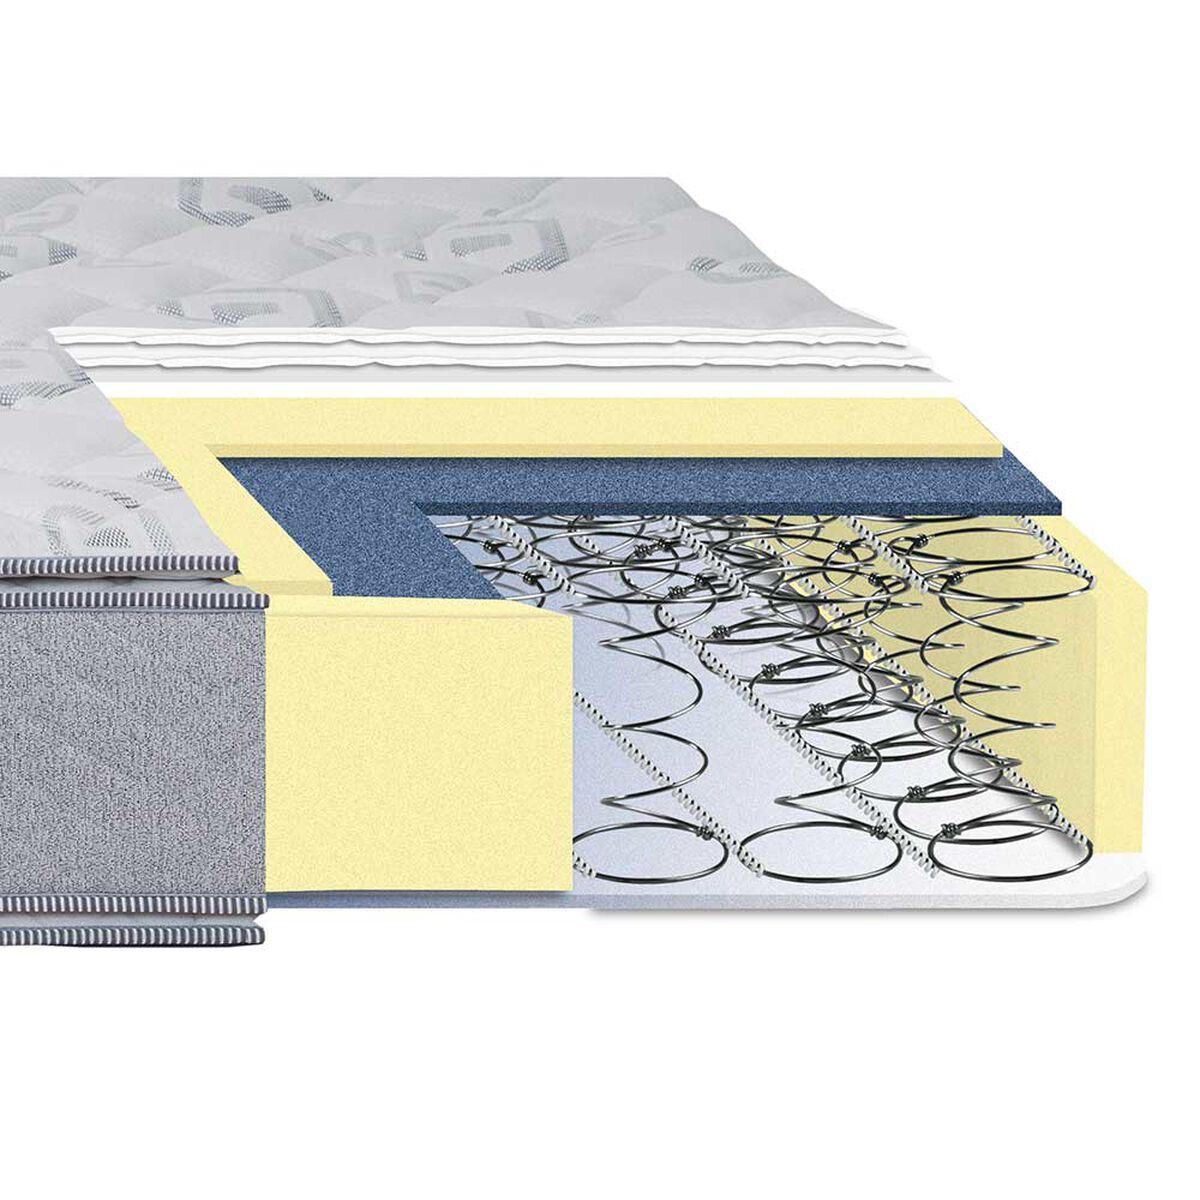 Box Ibérico Celta Terapeutic 1,5 Plazas + Set Textiles + Almohada